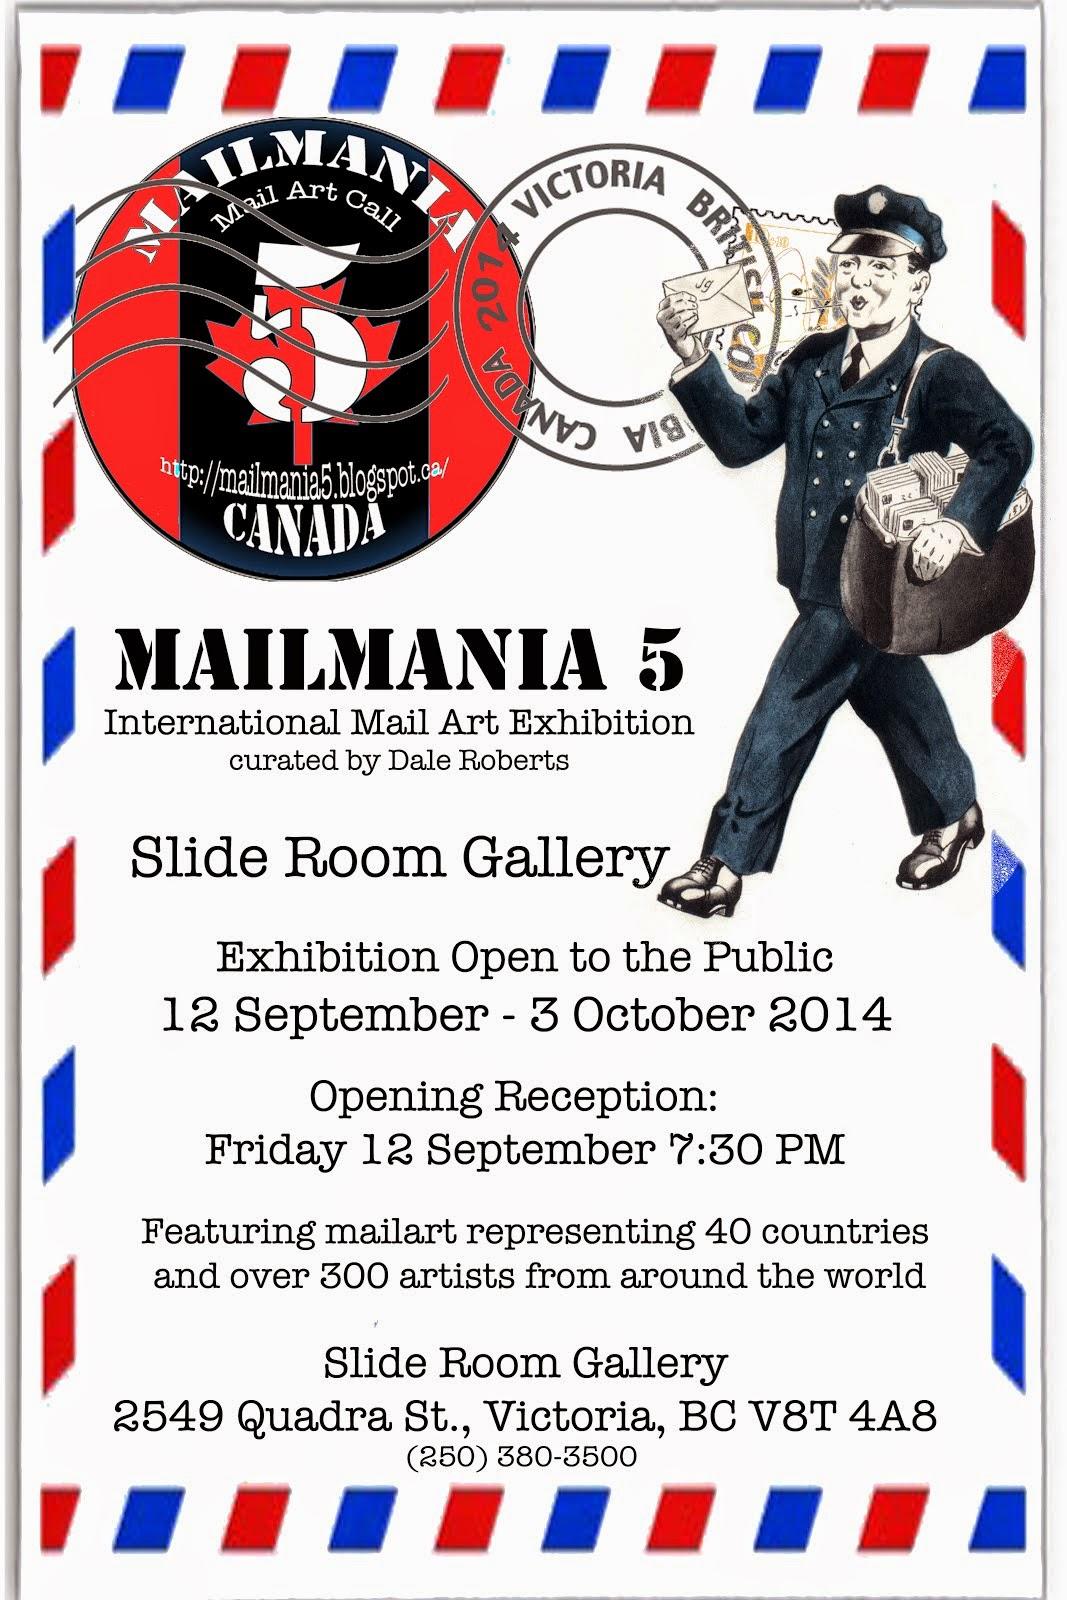 Mailmania 5 - Opening